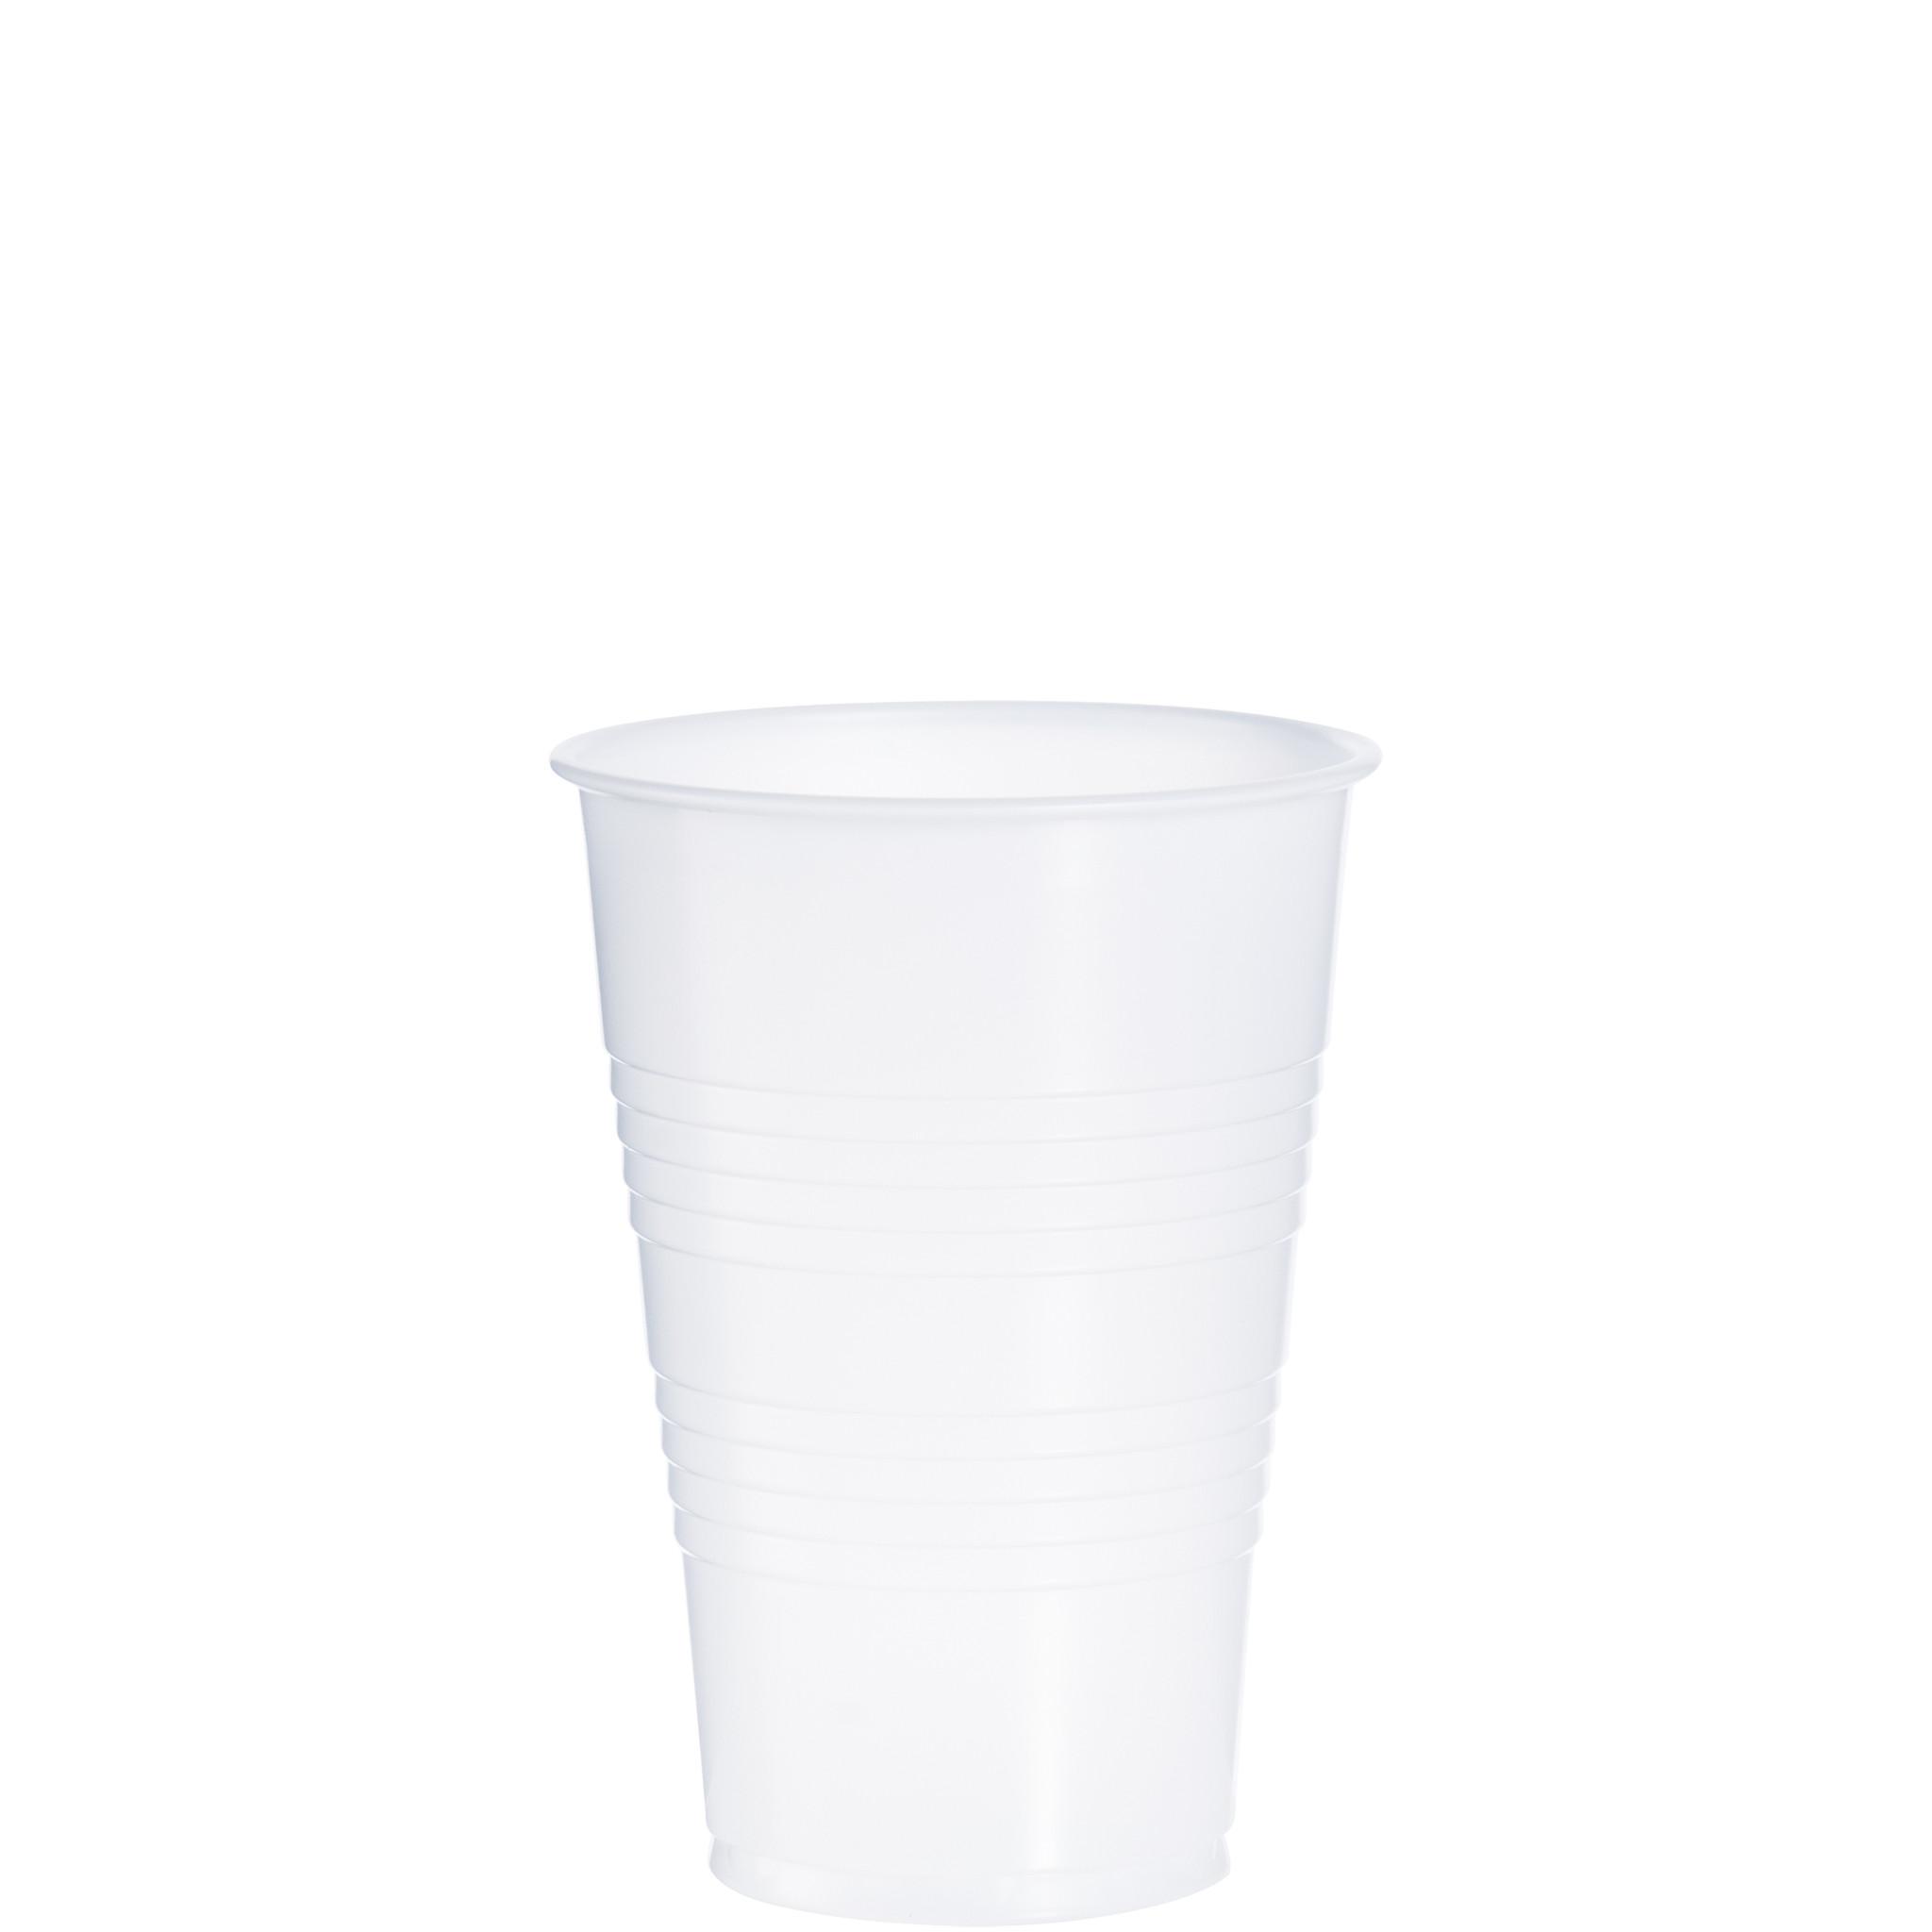 CUP Y16T TRANSLUCENT PLASTIC 16 OZ 1000/CASE